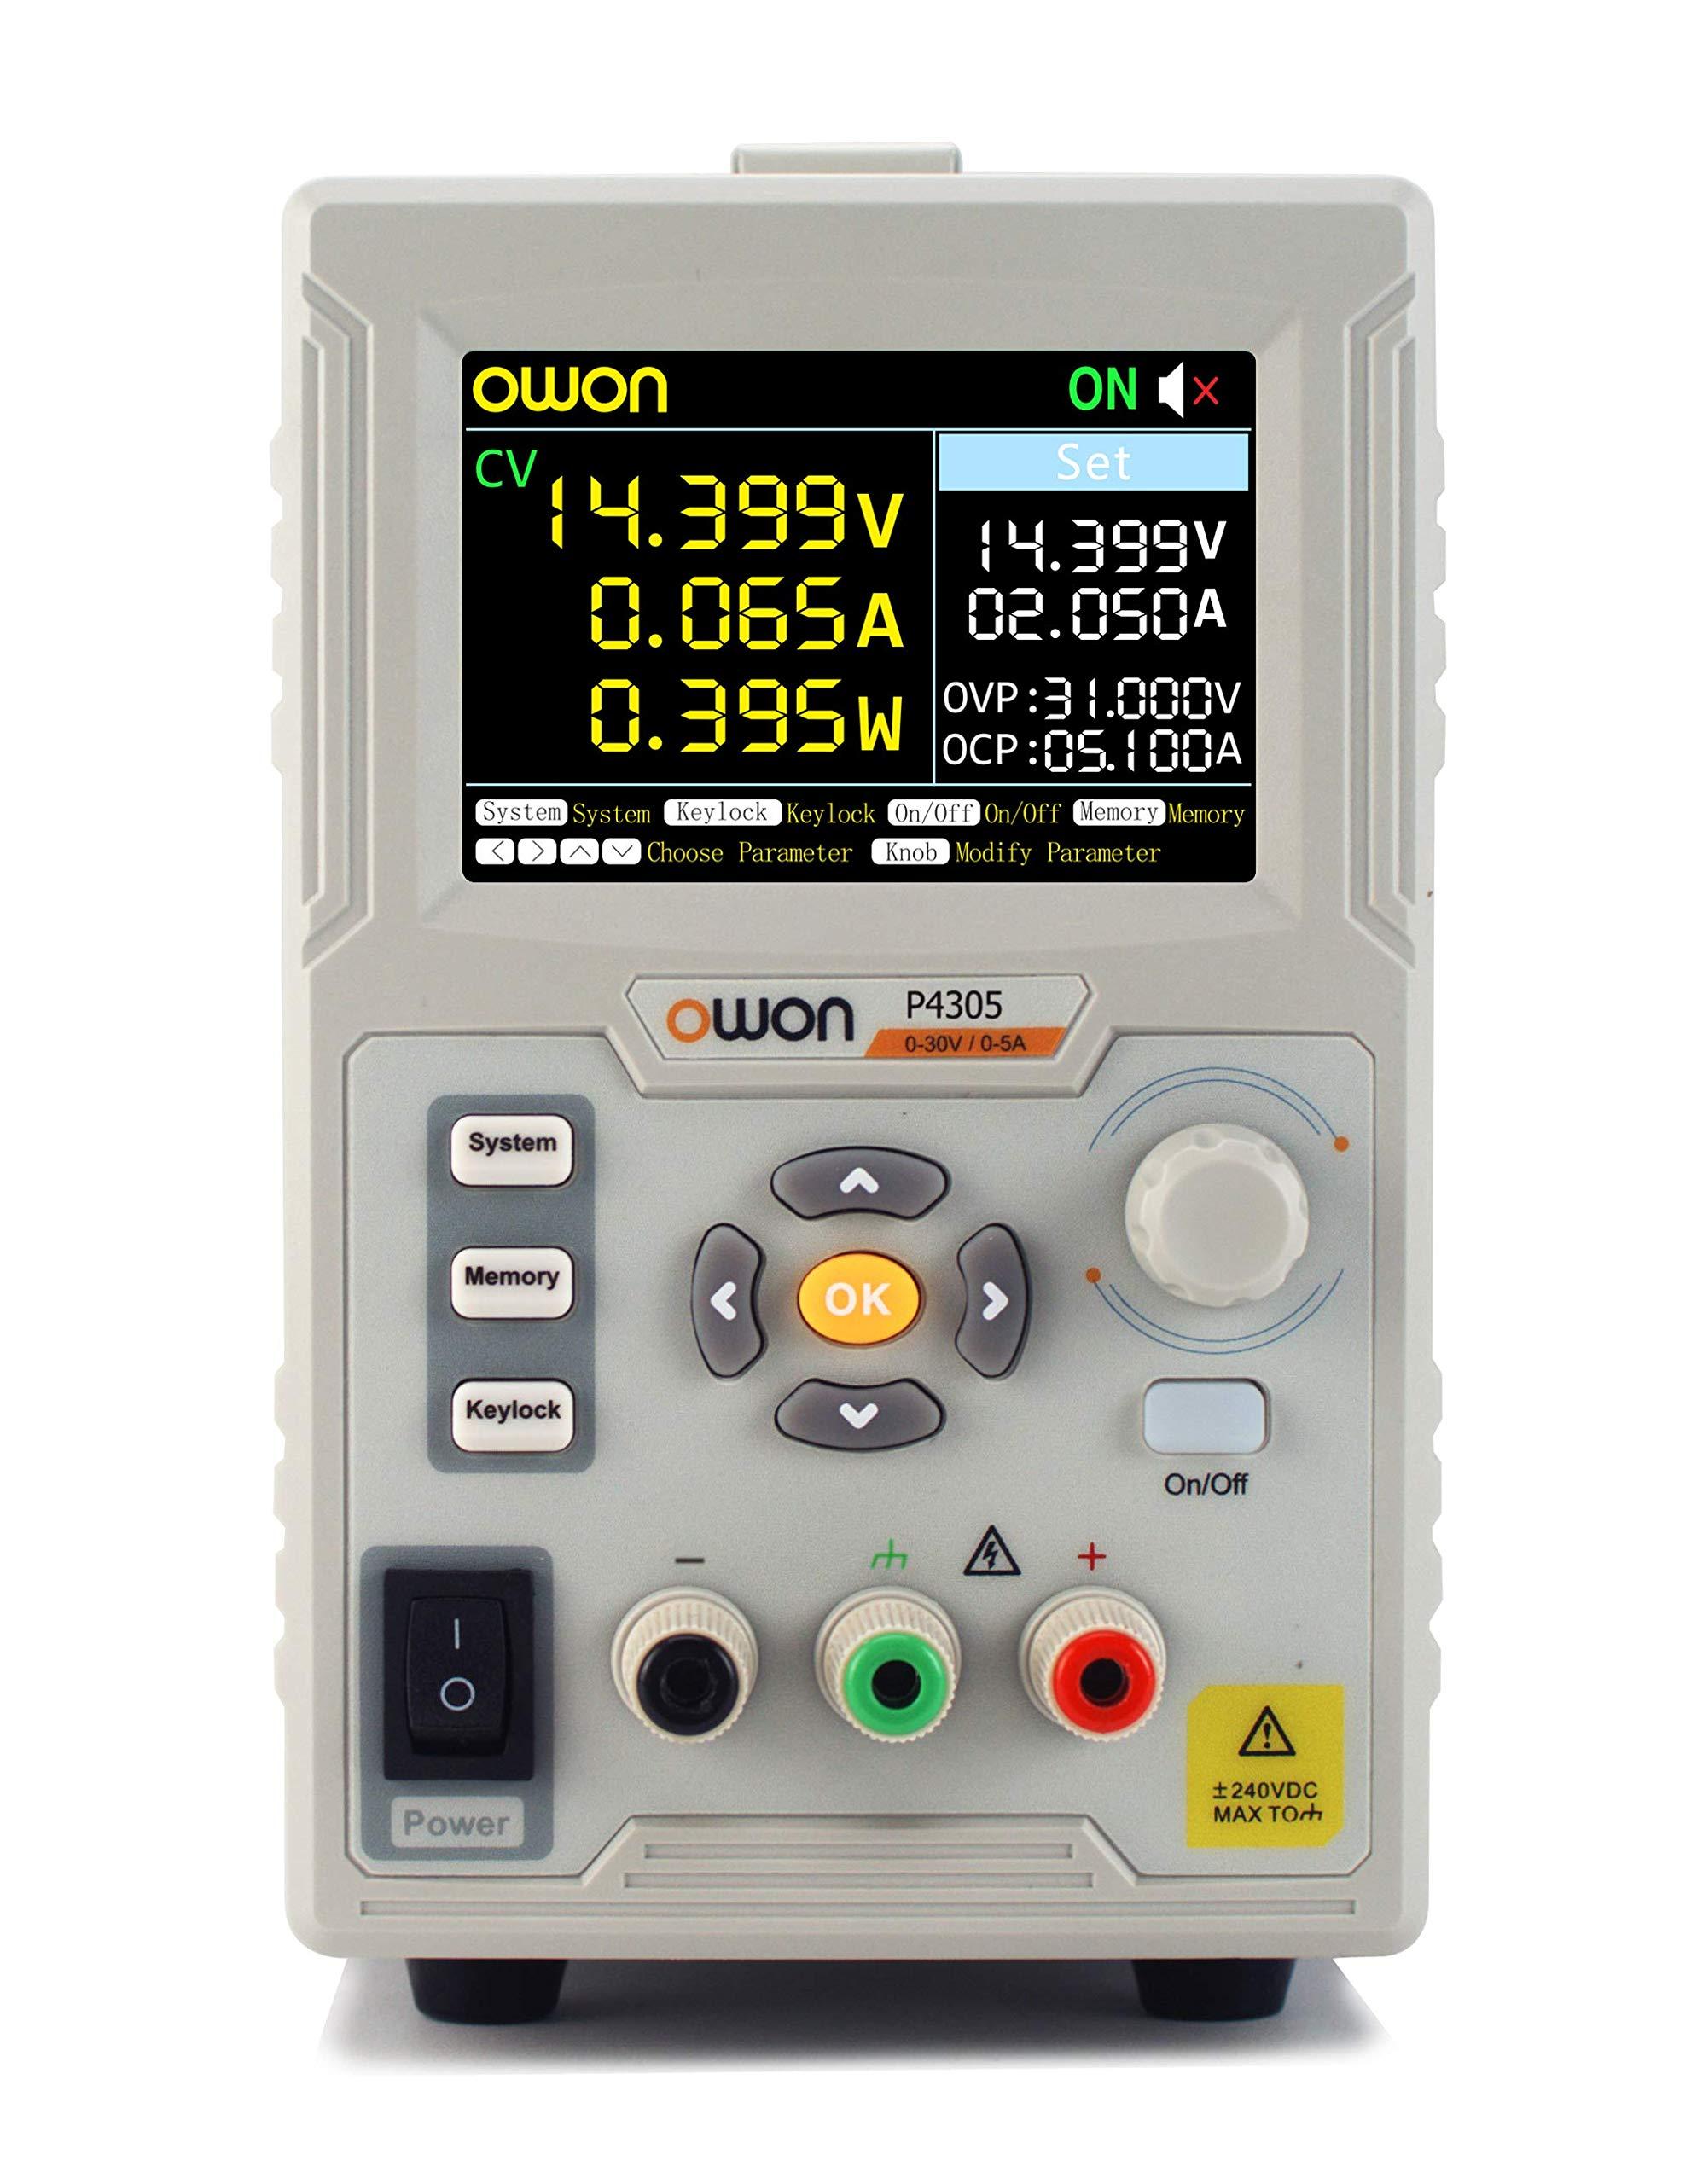 OWON P4305 Single Channel 150W Maximum Output 0-30V / 0-5A Output 1mV/1mA Linear DC Power Supply